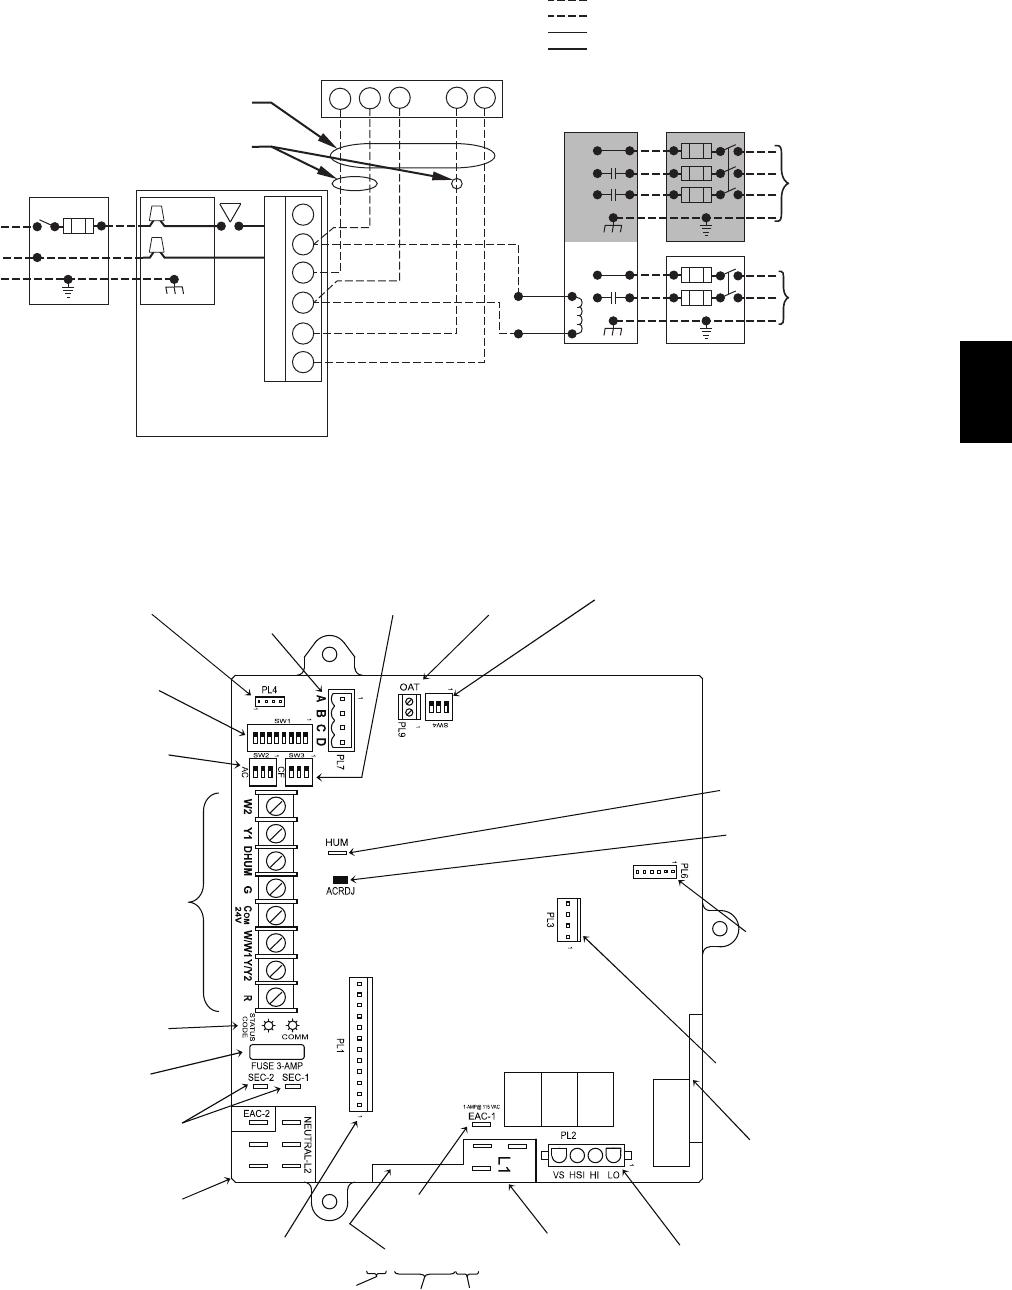 Bryant Furnace: Bryant Furnace Wiring Diagram